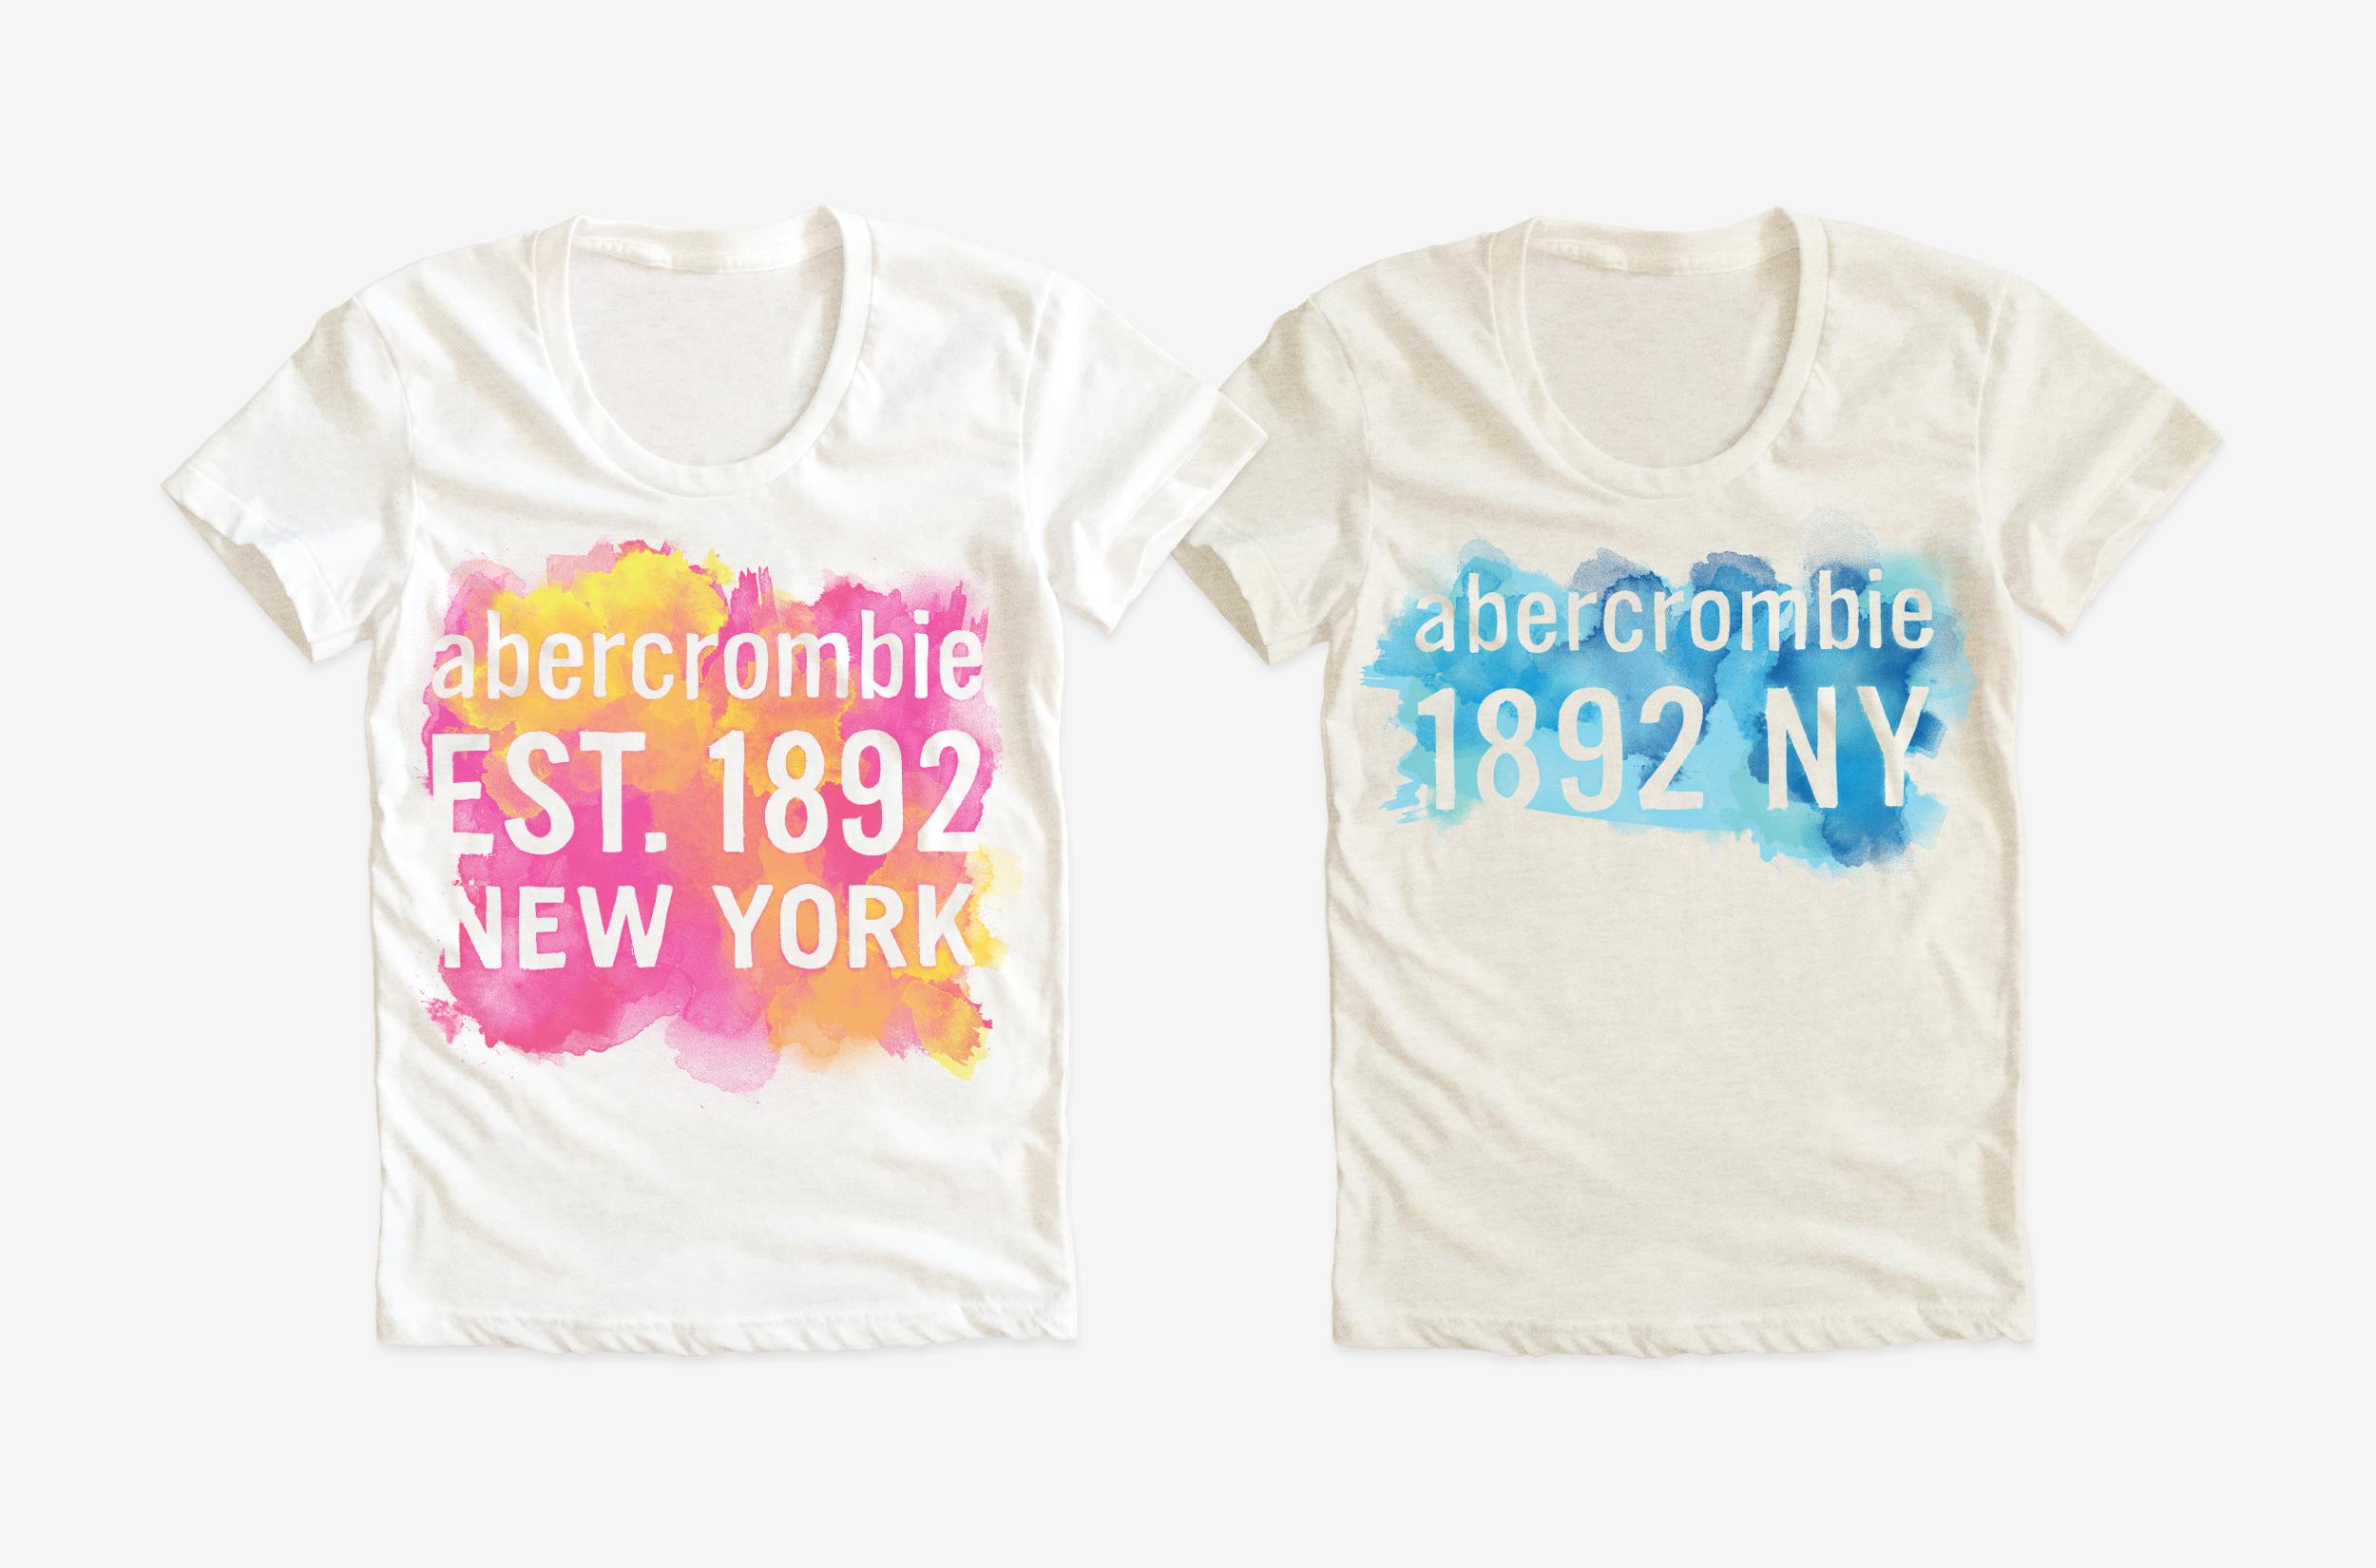 ABERCROMBIE KIDS / Girls t-shirt graphics